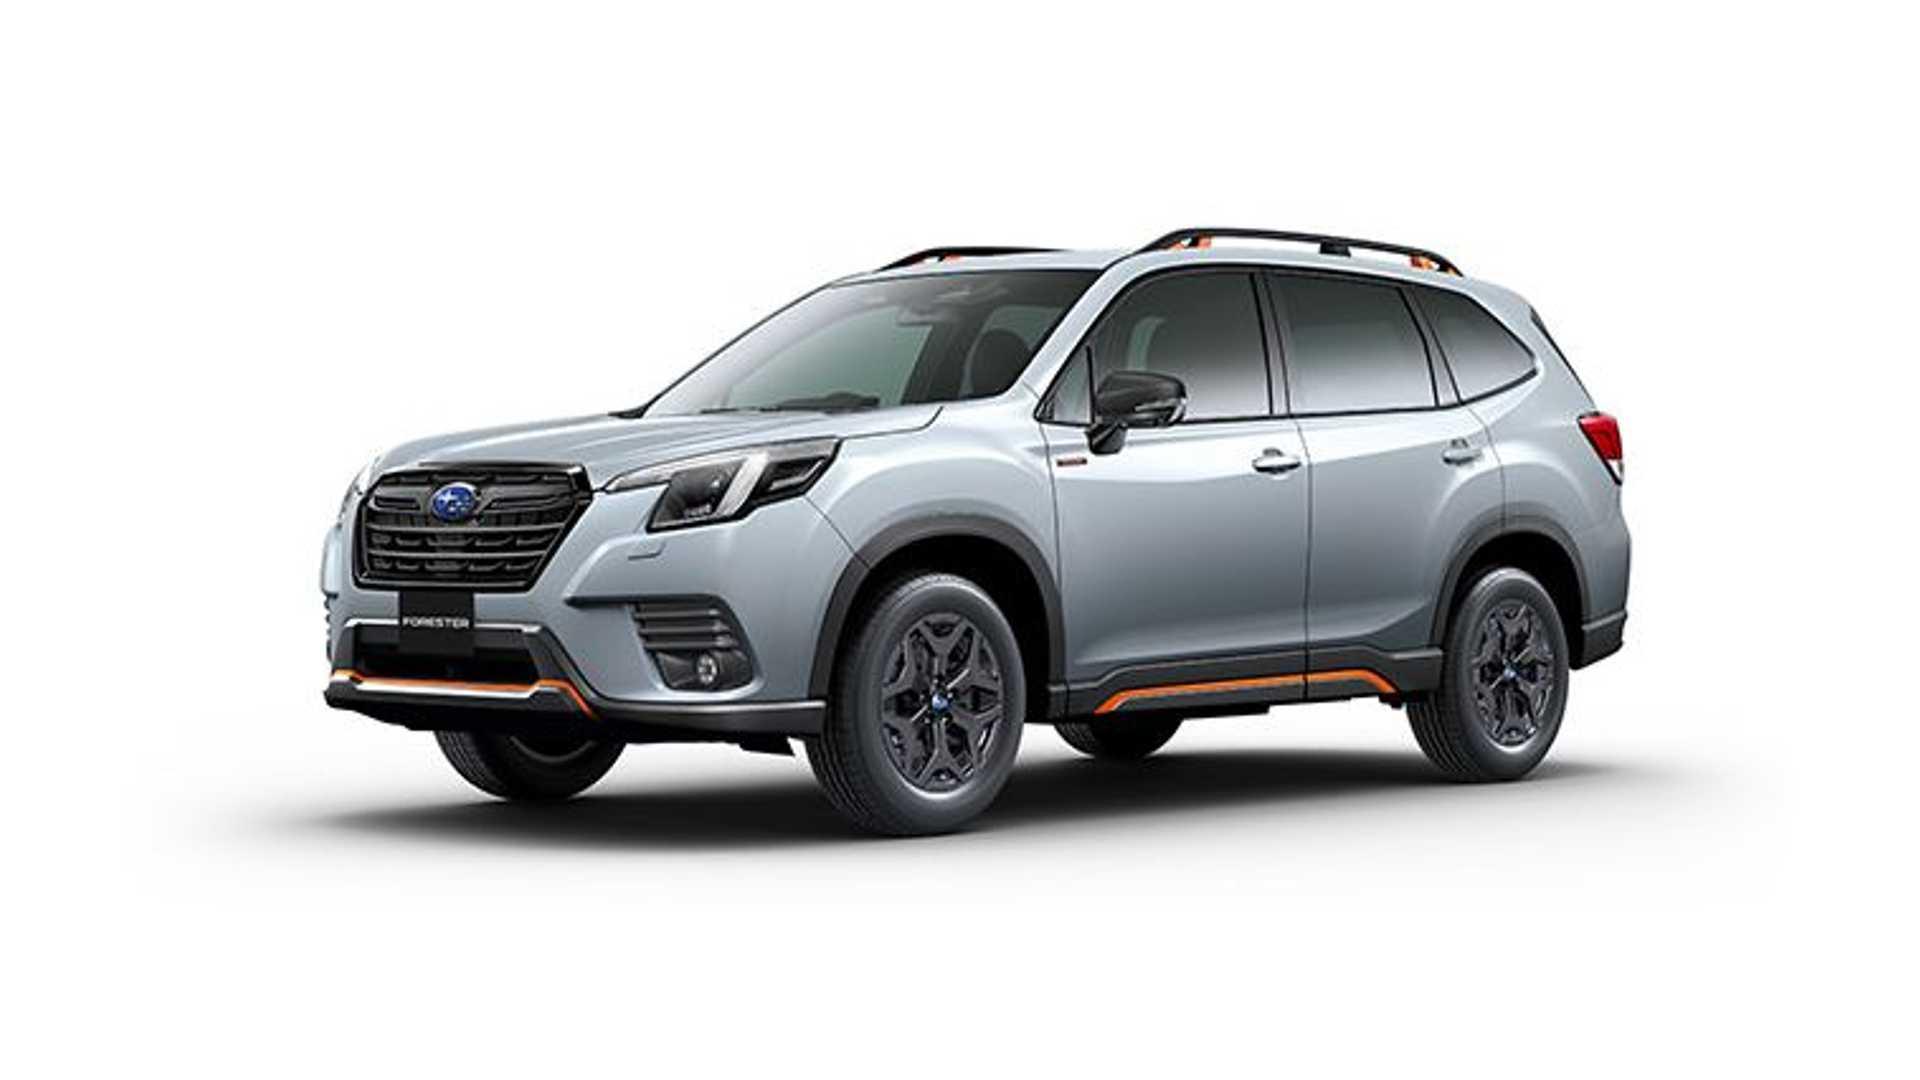 Subaru-Forester-facelift-12